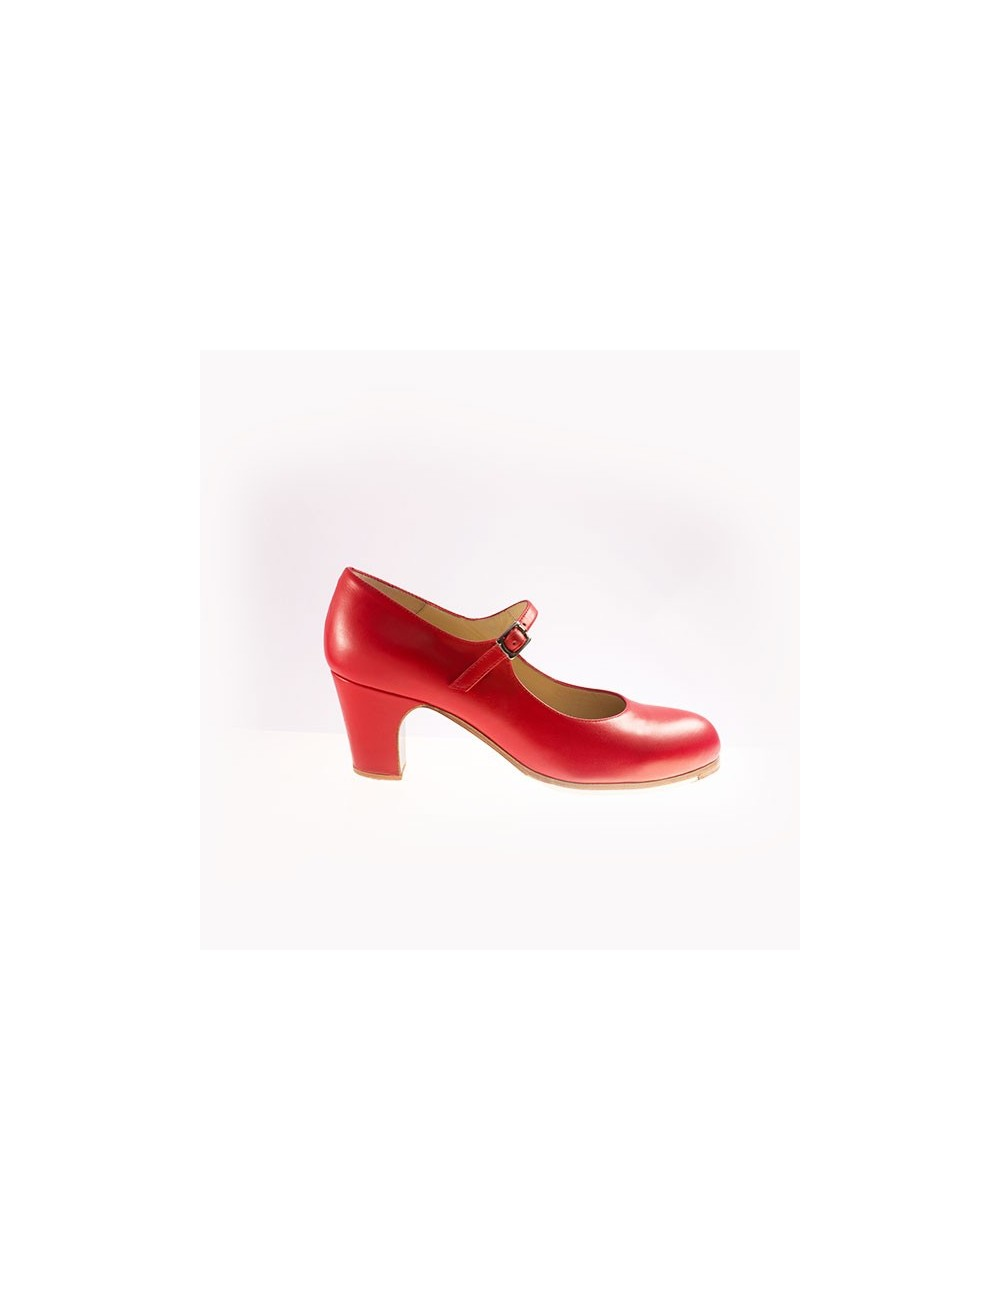 Chaussures pro flamenco Begona Correa M01 Rouge